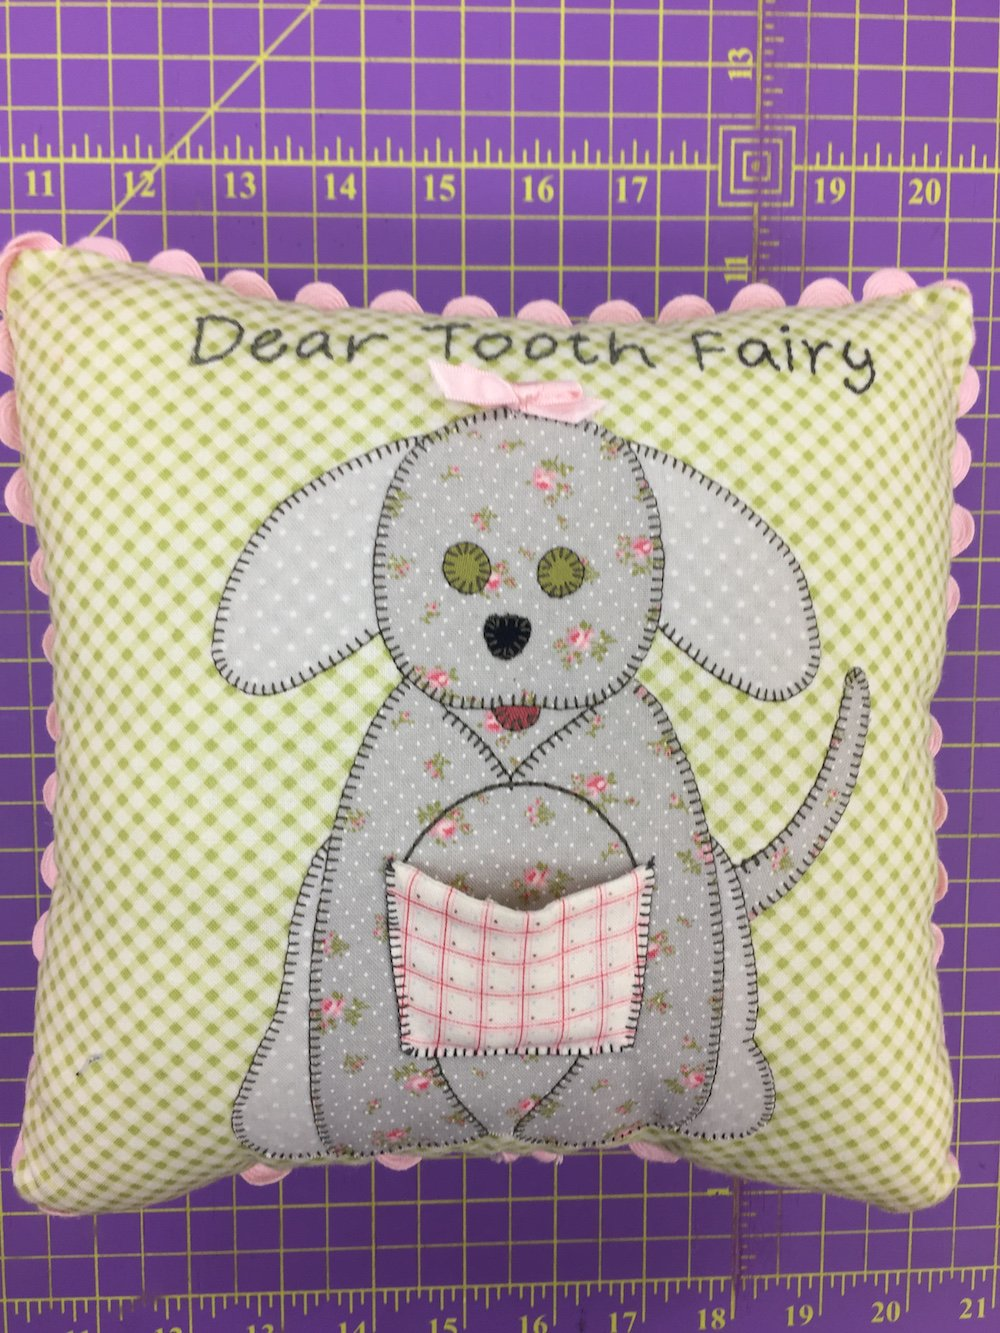 Dear Tooth Fairy Pillow Kit for Girls